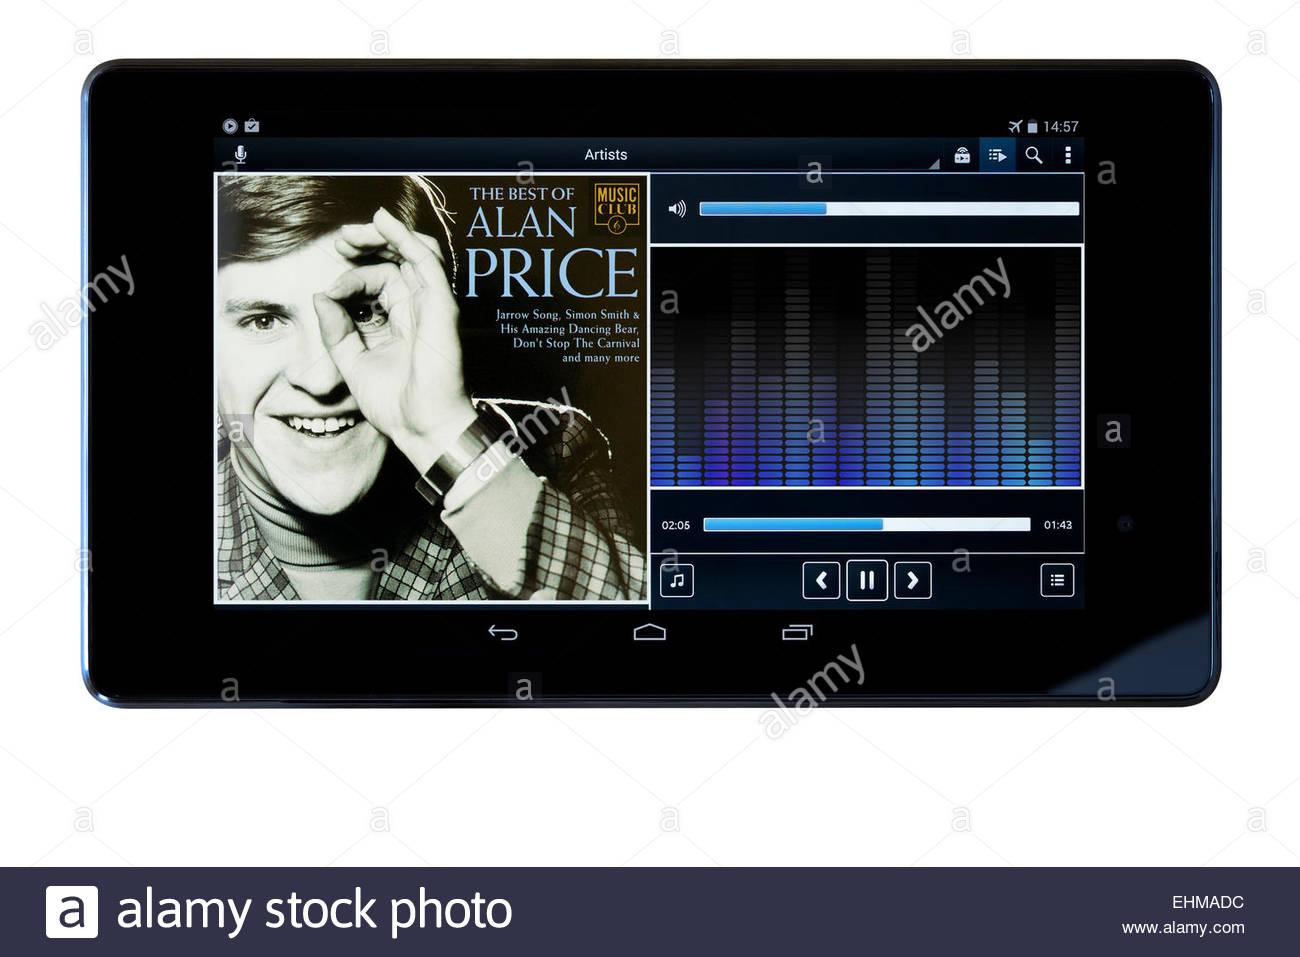 Alan Price Best Of album, MP3 album art on PC tablet, England - Stock Image